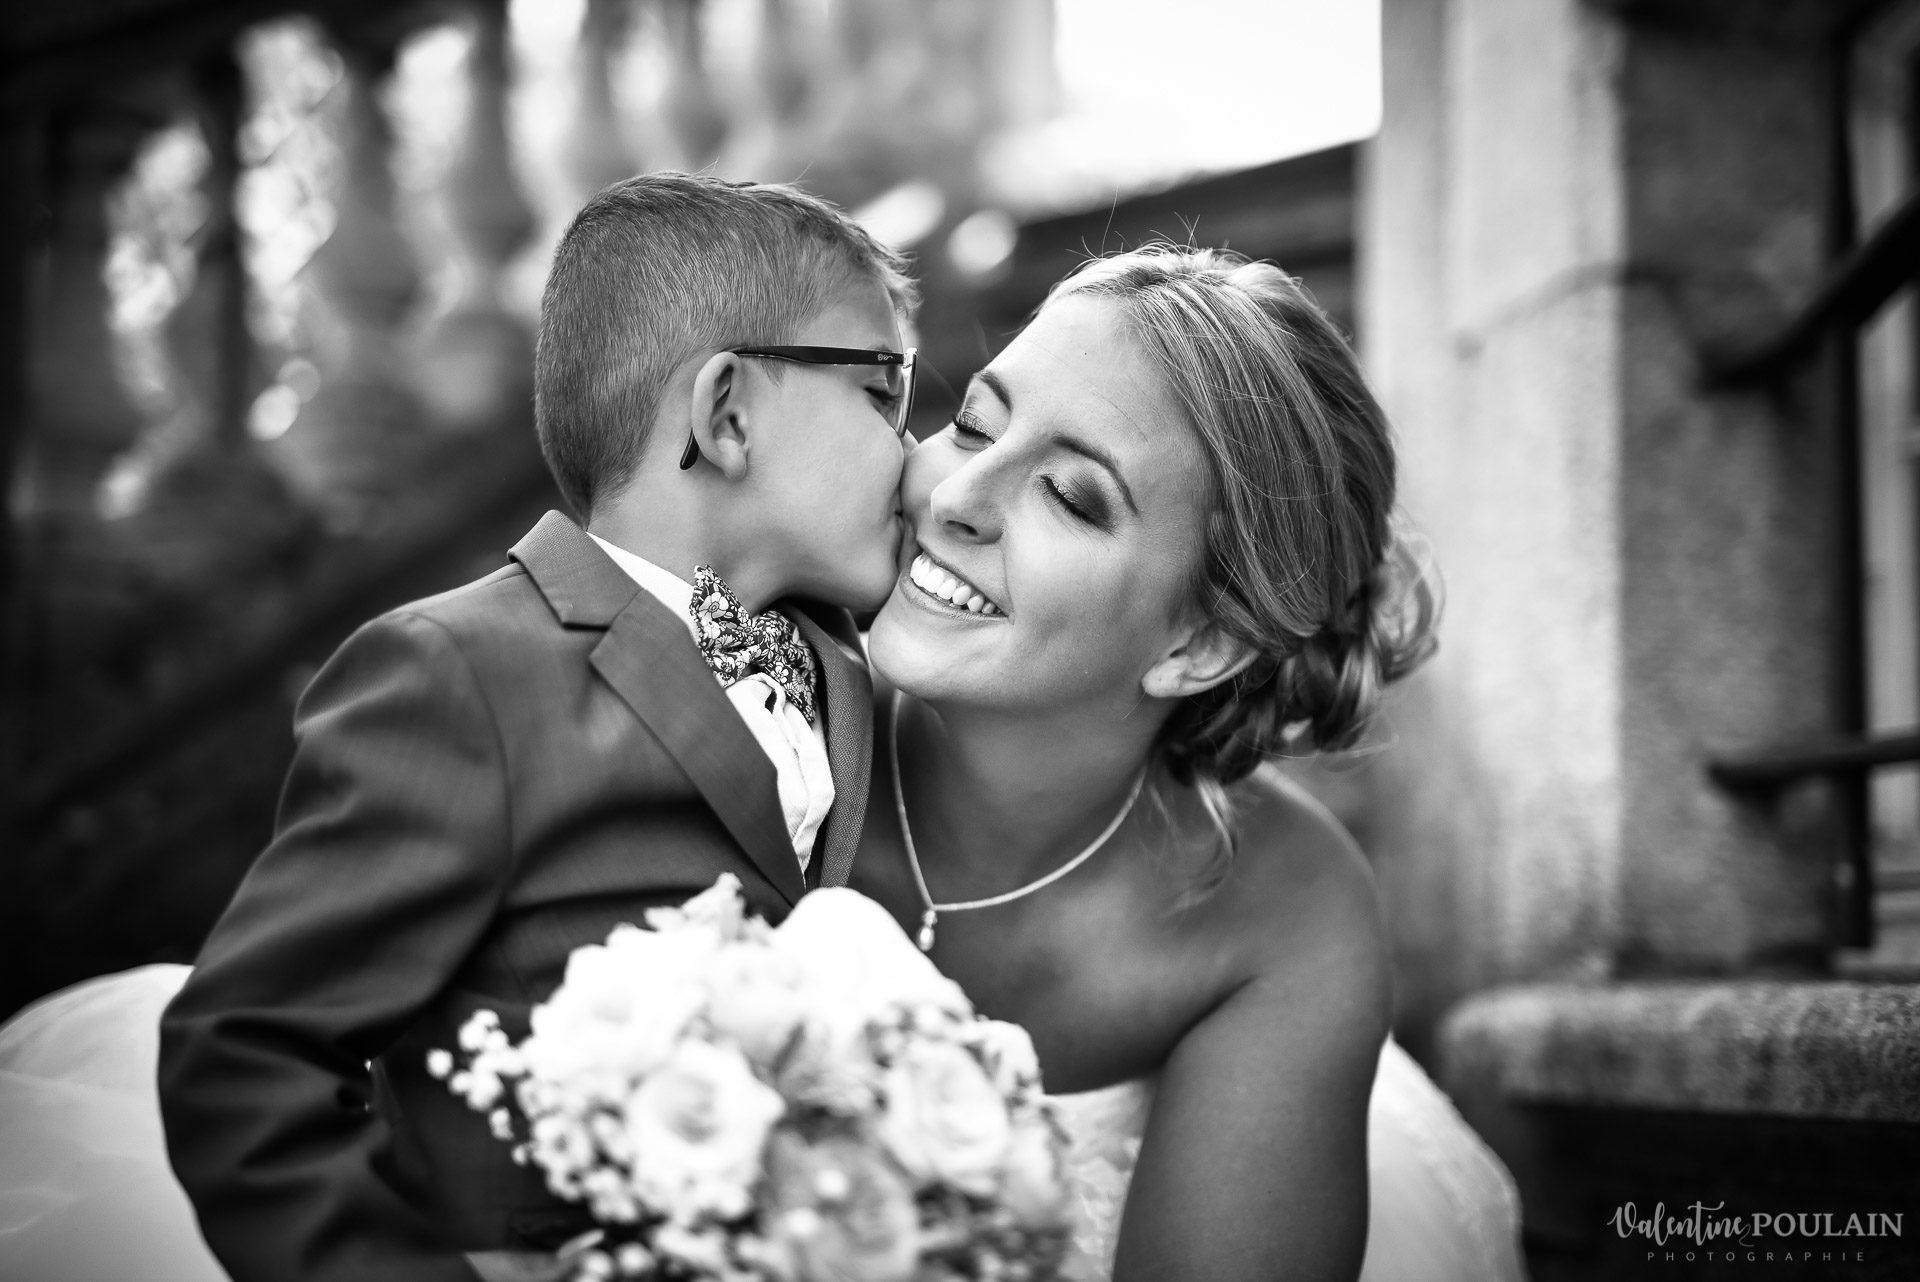 Mariage fun Petit Wettolsheim - Valentine Poulain baiser